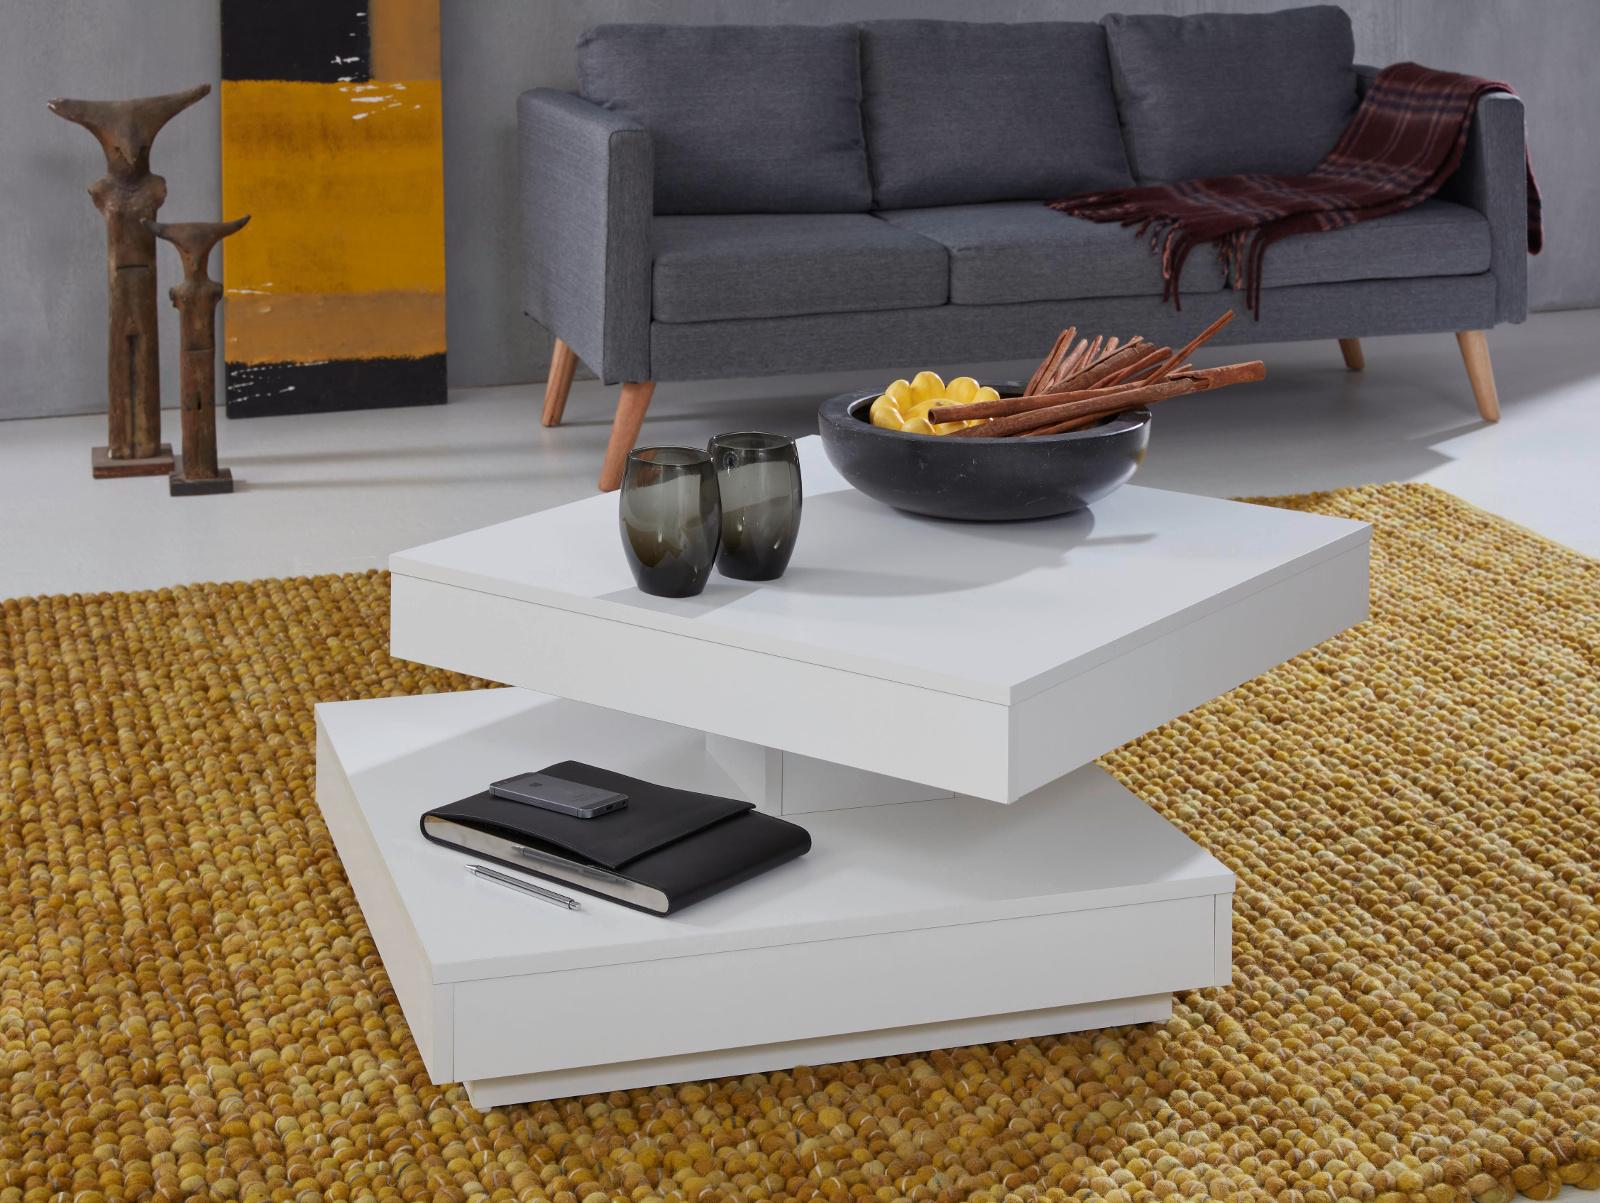 couchtisch wei drehbar quadratisch 70 cm. Black Bedroom Furniture Sets. Home Design Ideas